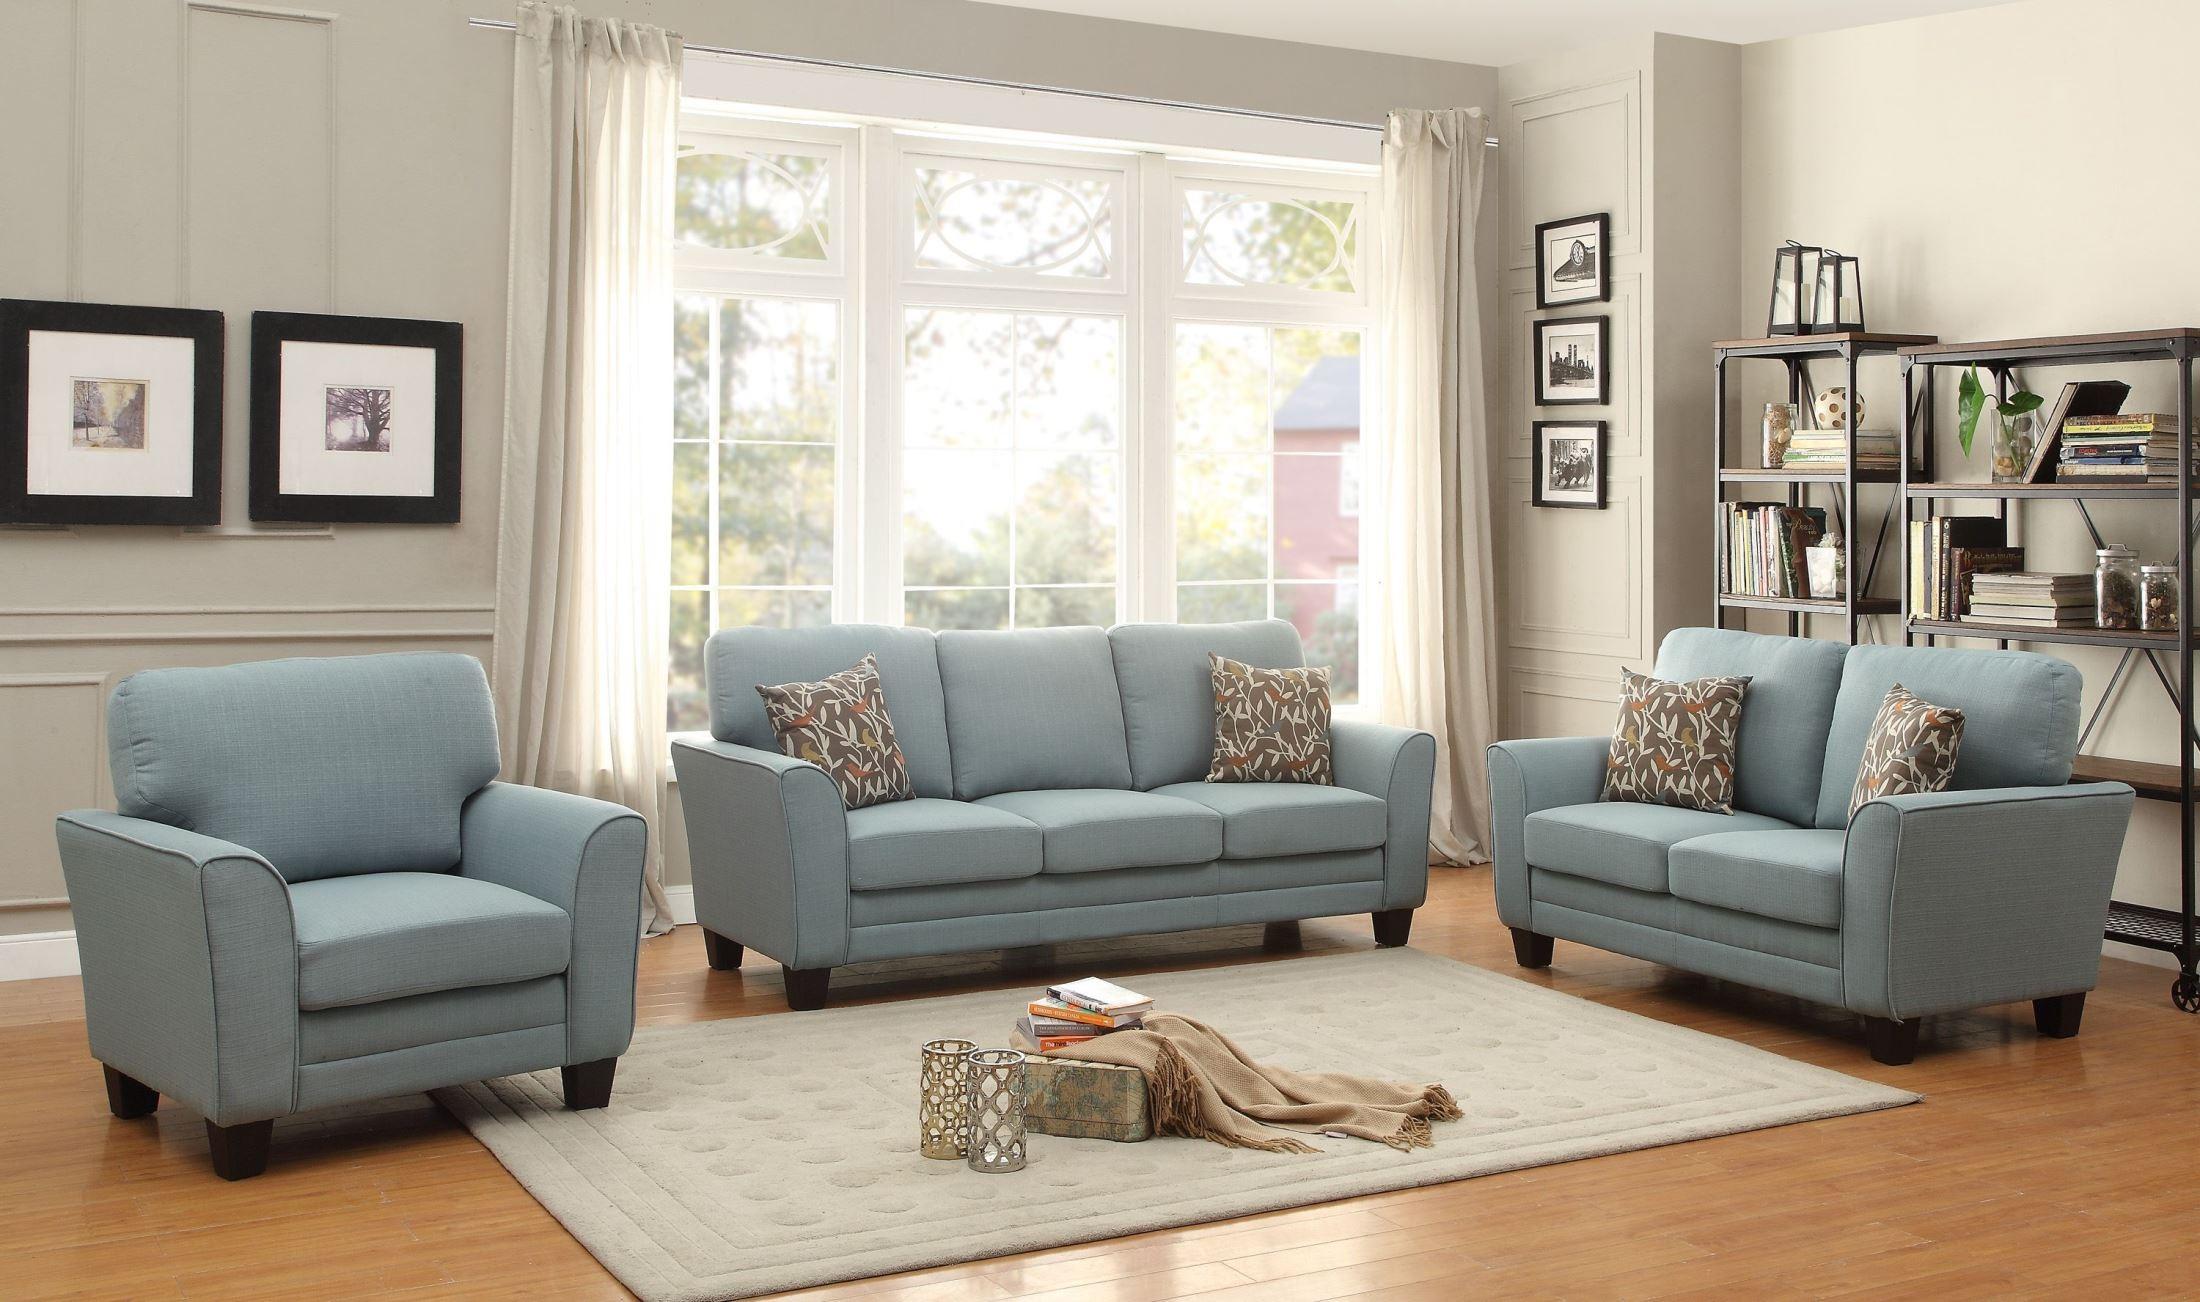 Adair Teal Living Room Set from Homelegance (8413TL-3)   Coleman Furniture